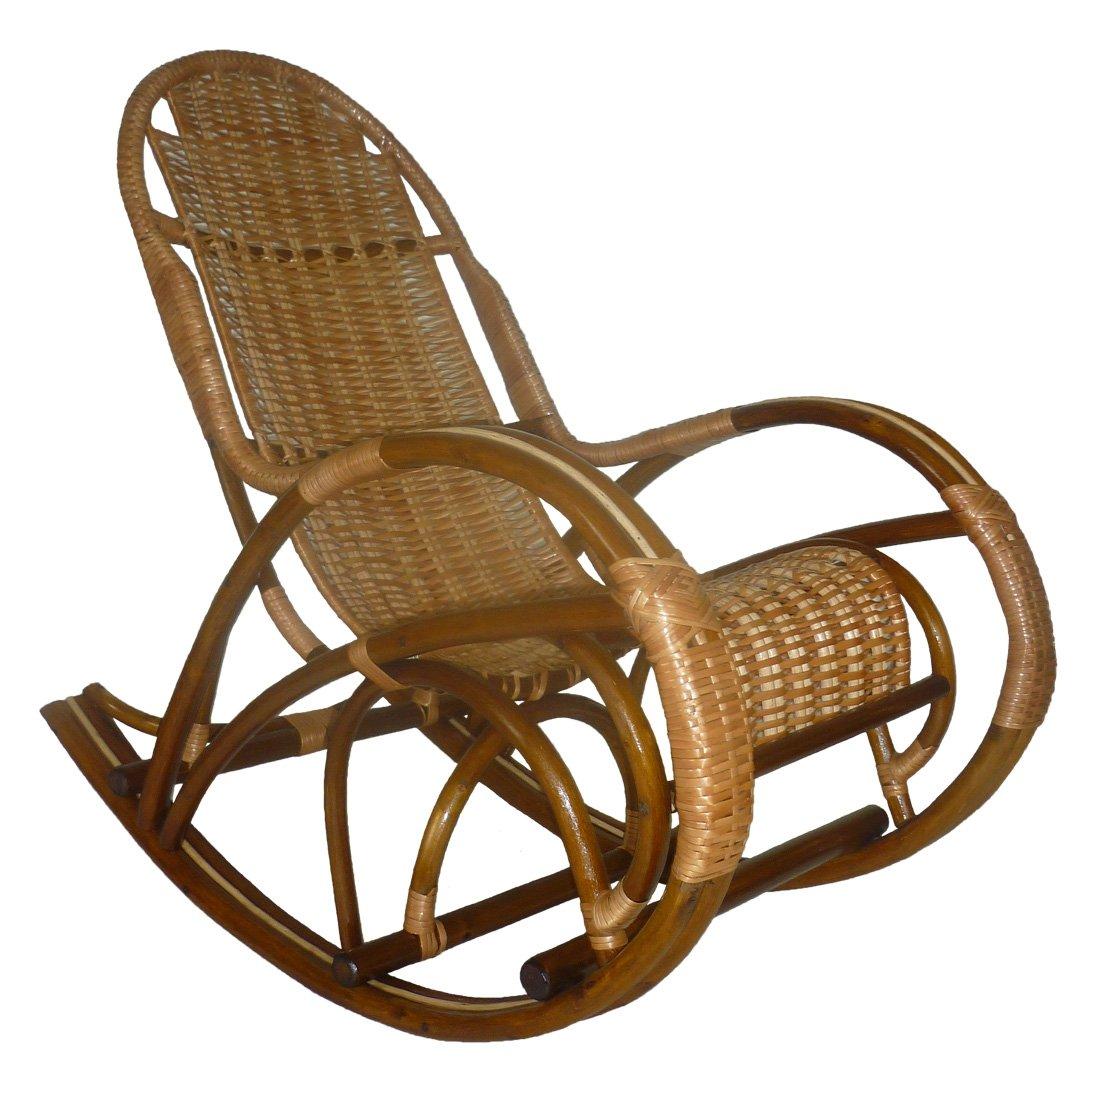 Кресло-качалка глайдер своими руками чертежи фото 912